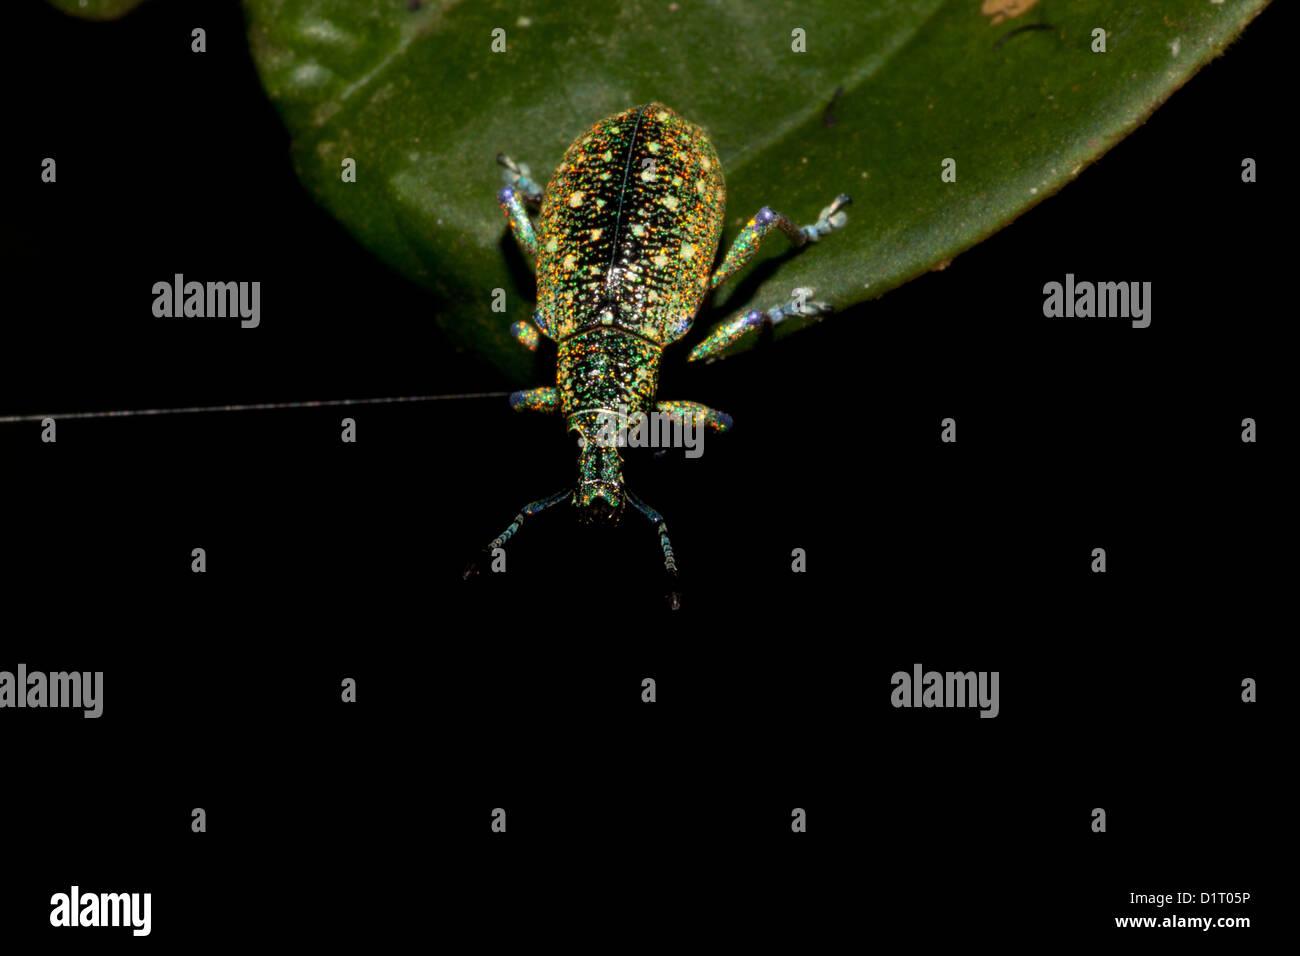 Weevil beetle in the rainforest at Burbayar, near Llano Carti, altitude 300 m, Panama province, Republic of Panama. - Stock Image